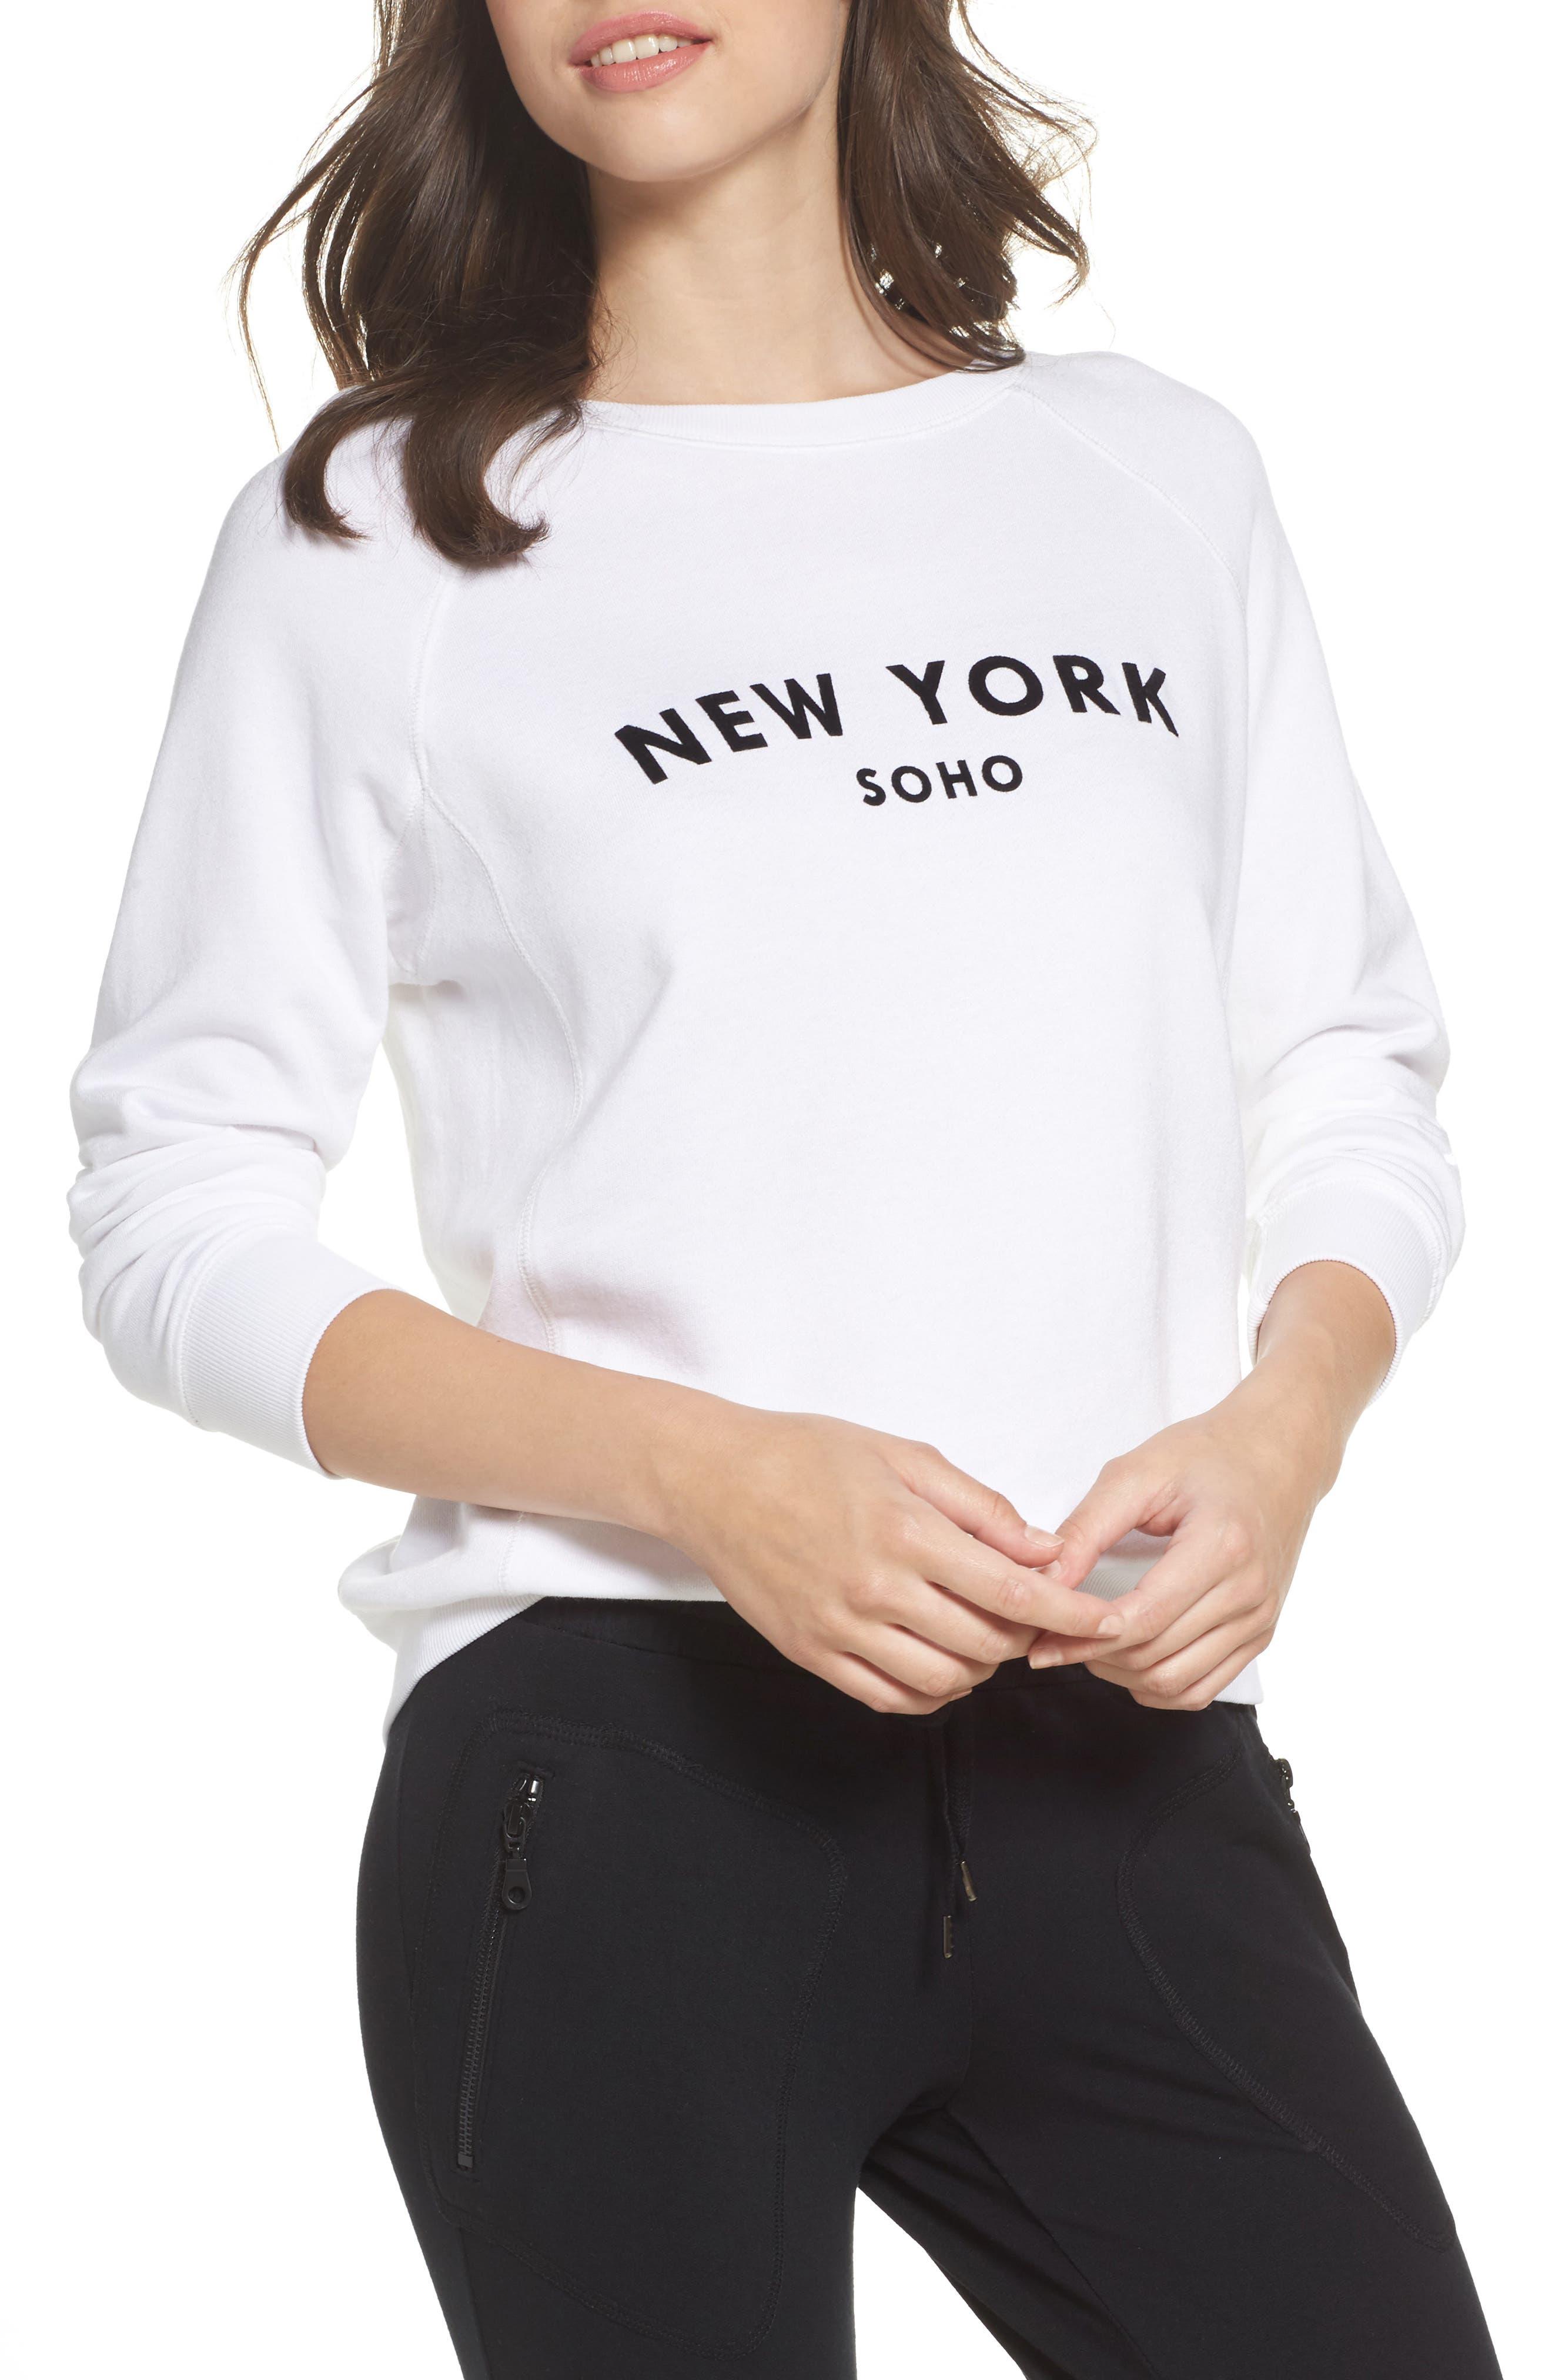 New York Soho Raglan Pullover,                             Main thumbnail 1, color,                             White